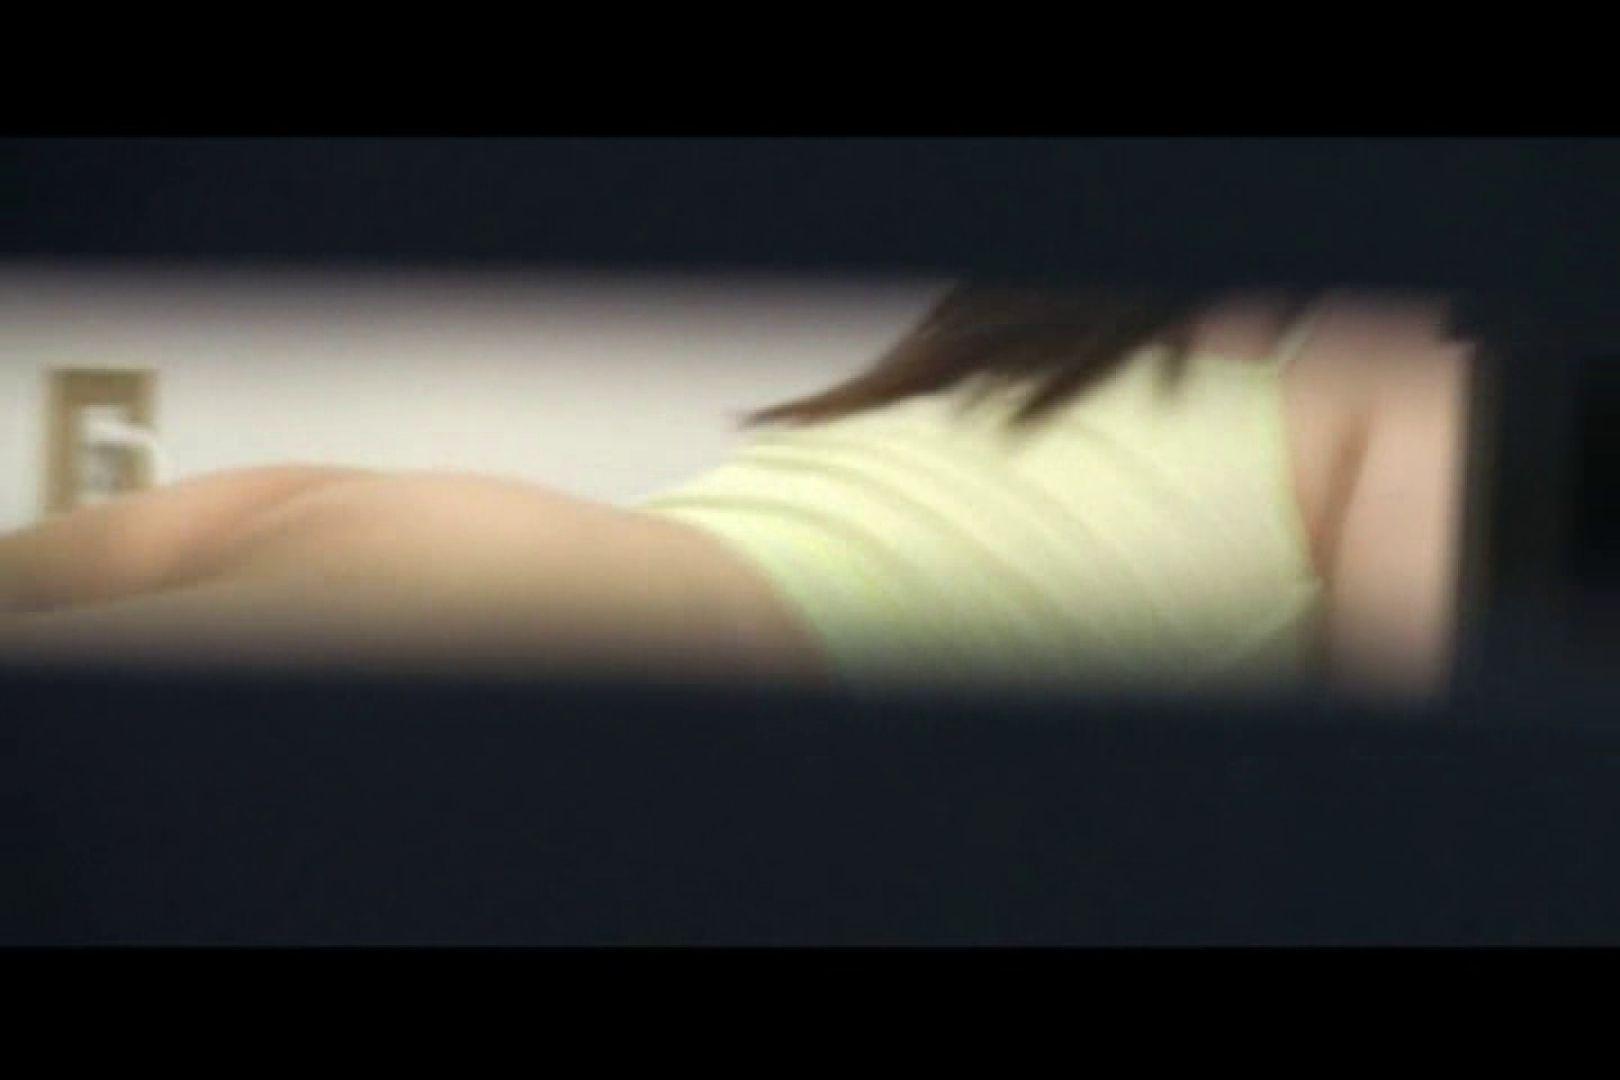 独占配信!無修正! 看護女子寮 vol.12 ナースのエロ動画 SEX無修正画像 78PIX 59